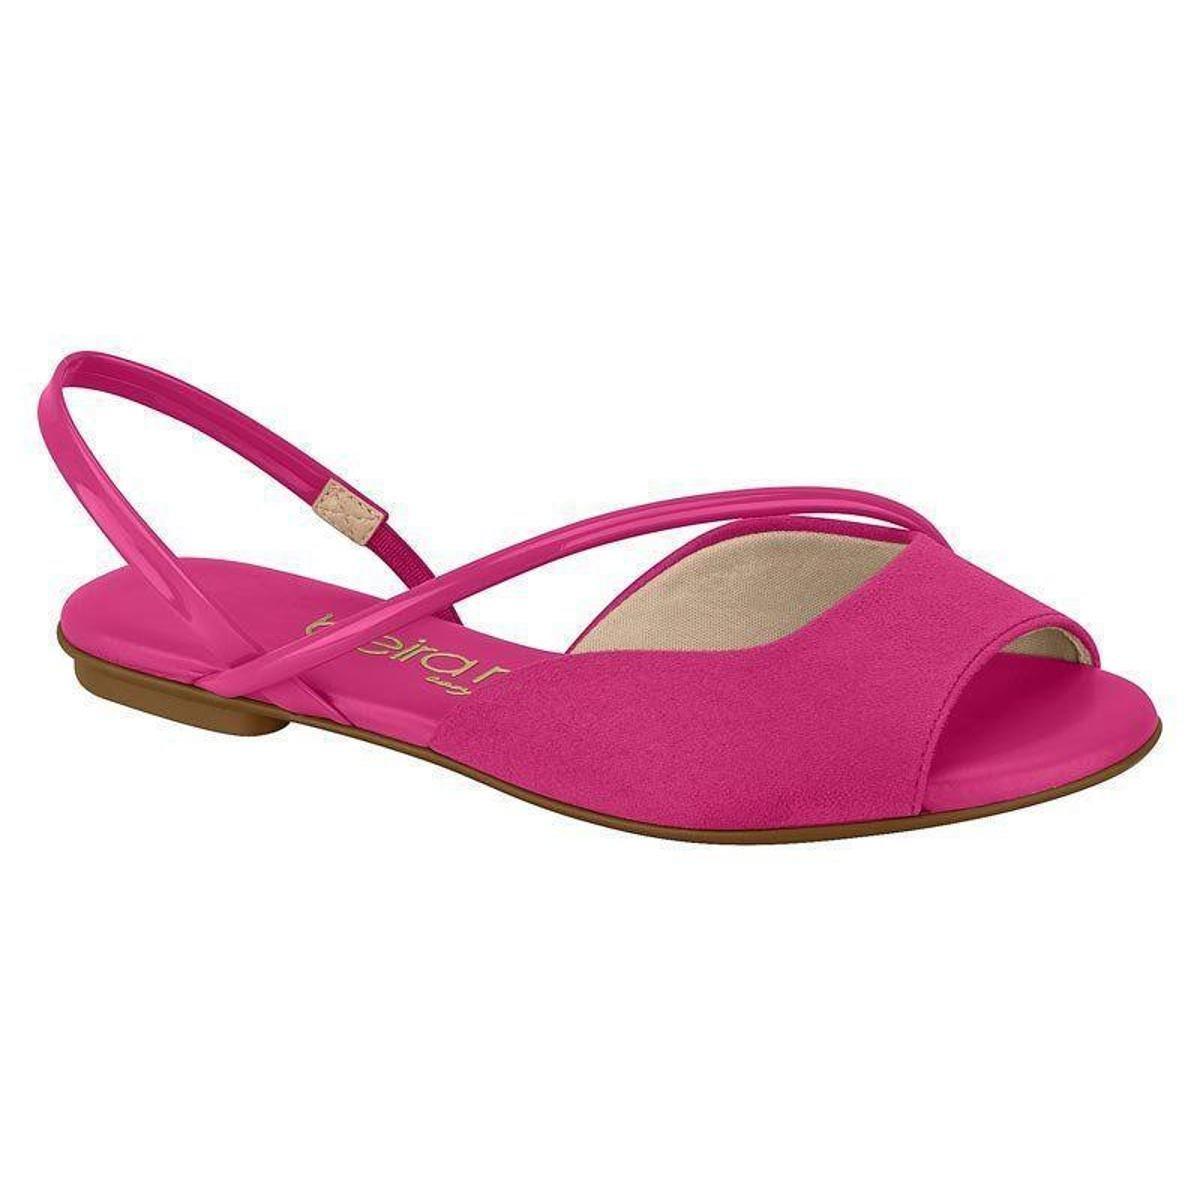 Rasteira Beira Rio Conforto Pink 8226.1075